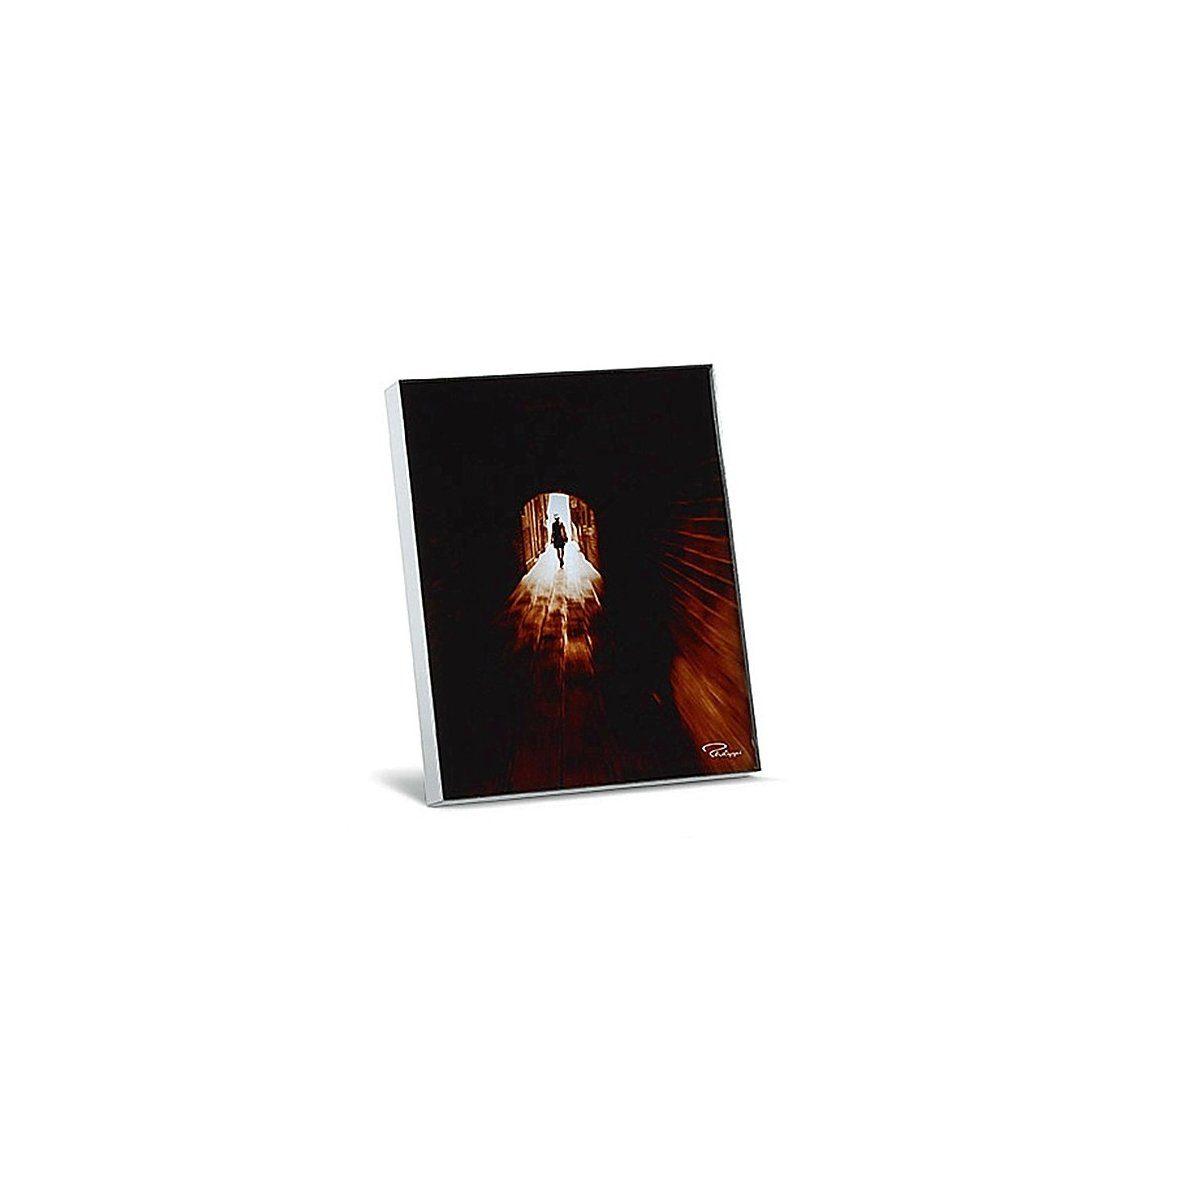 Philippi PHILIPPI Fotorahmen SCENE Größe L, 25 x 35 cm